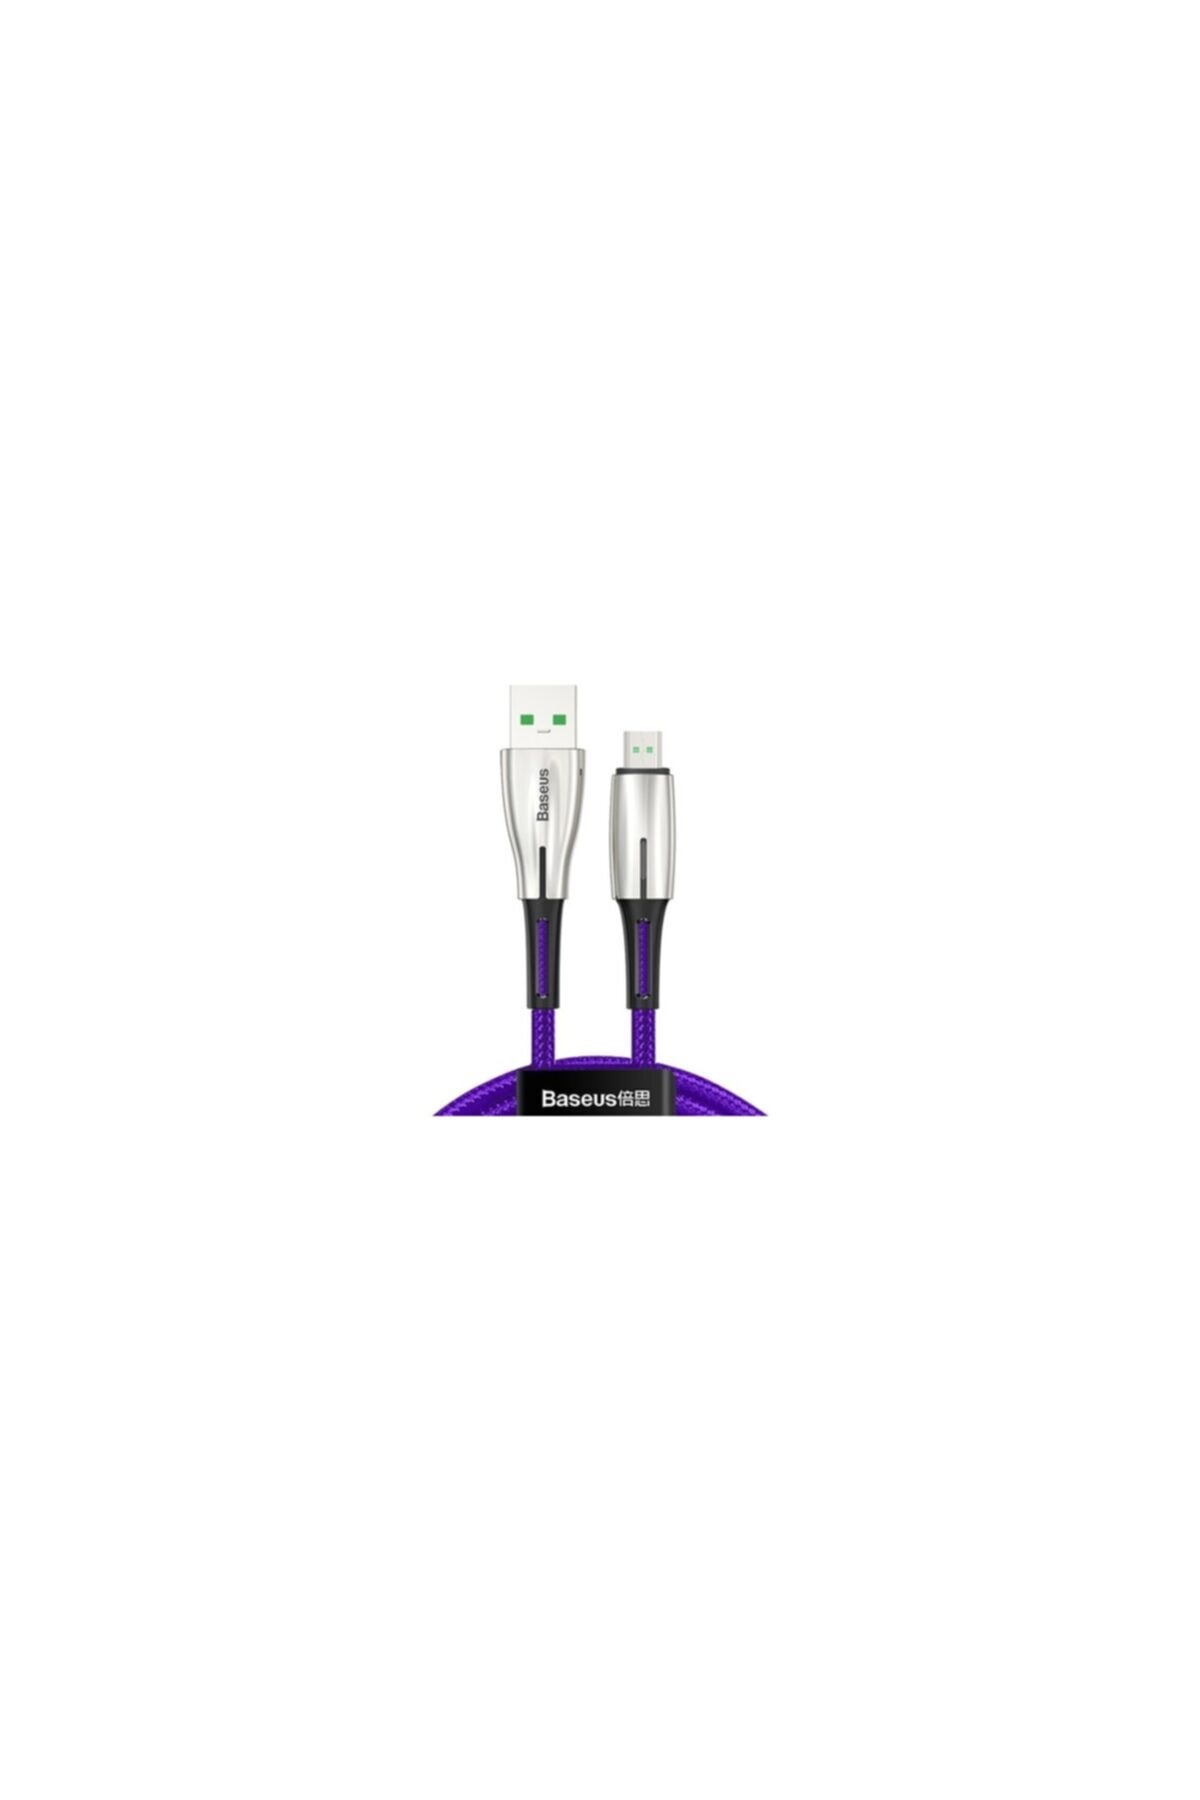 Baseus Camrd-b01 4a Waterdrop Micro Usb 4a Hızlı Şarj Usb Kablo 1 Mt 1